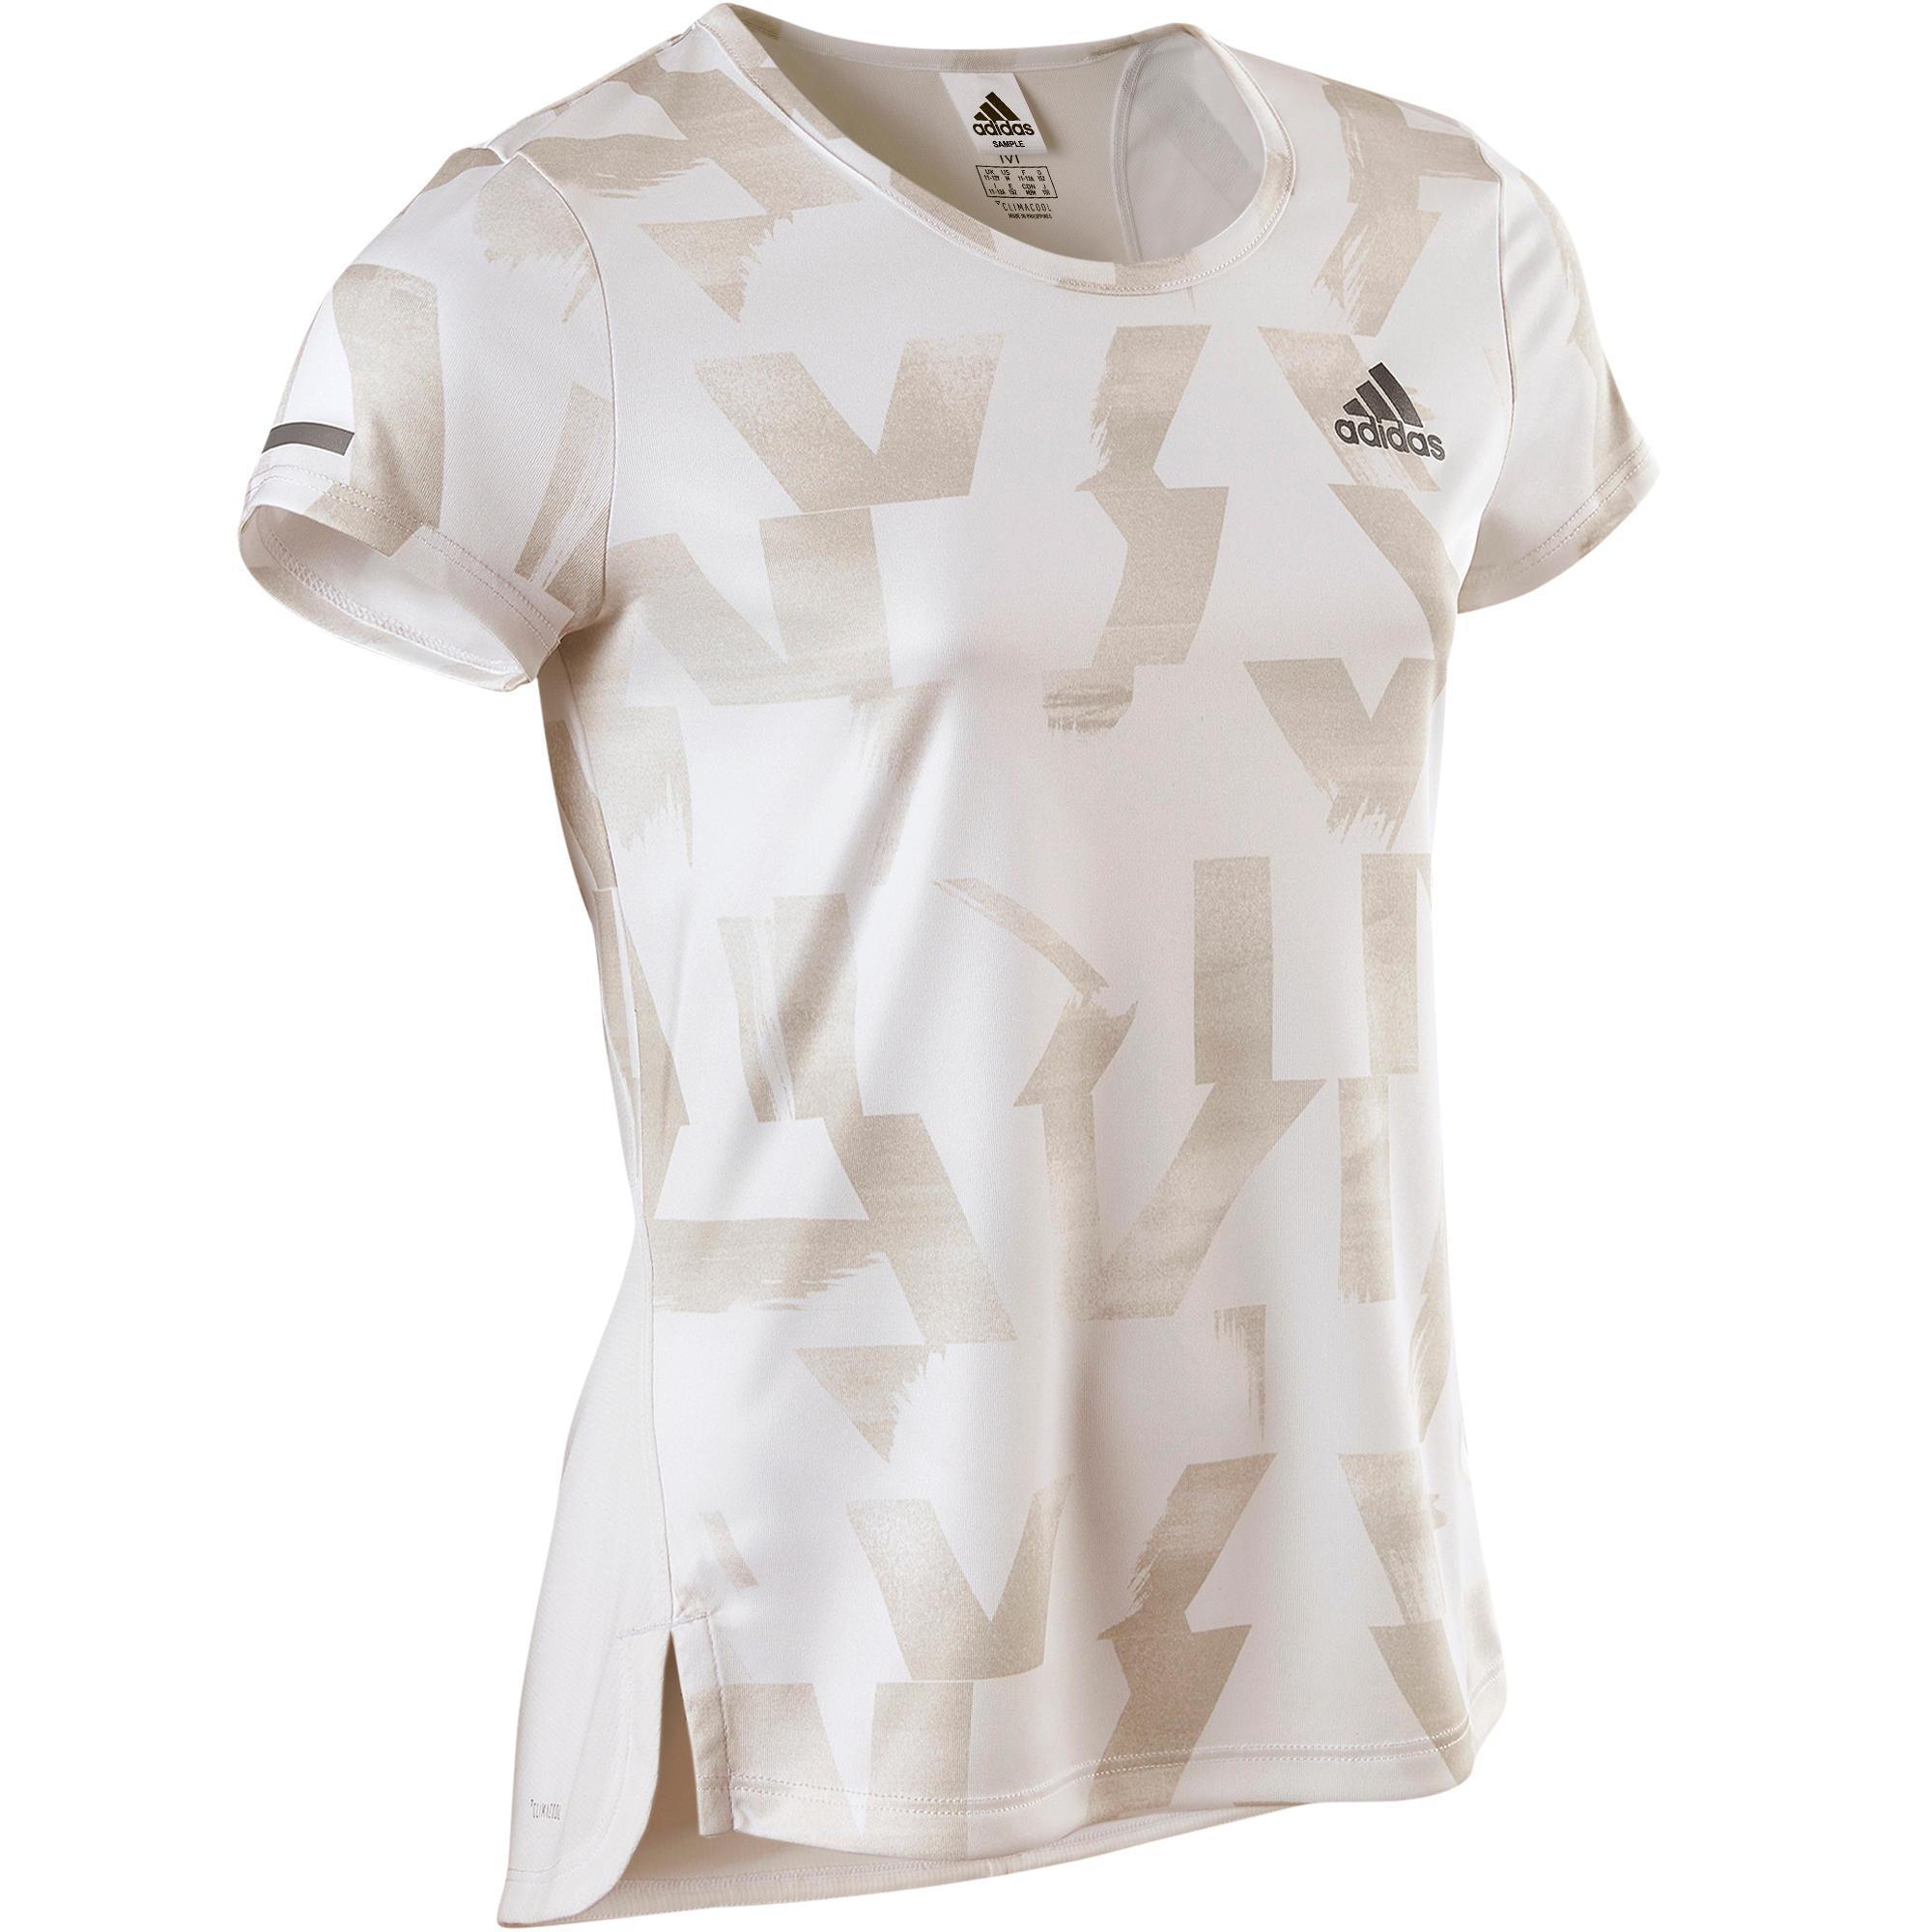 Transpirable Niña Gimnasia De Blanco Adidas Camiseta Manga Corta qAwxXY 6aad8a481753e